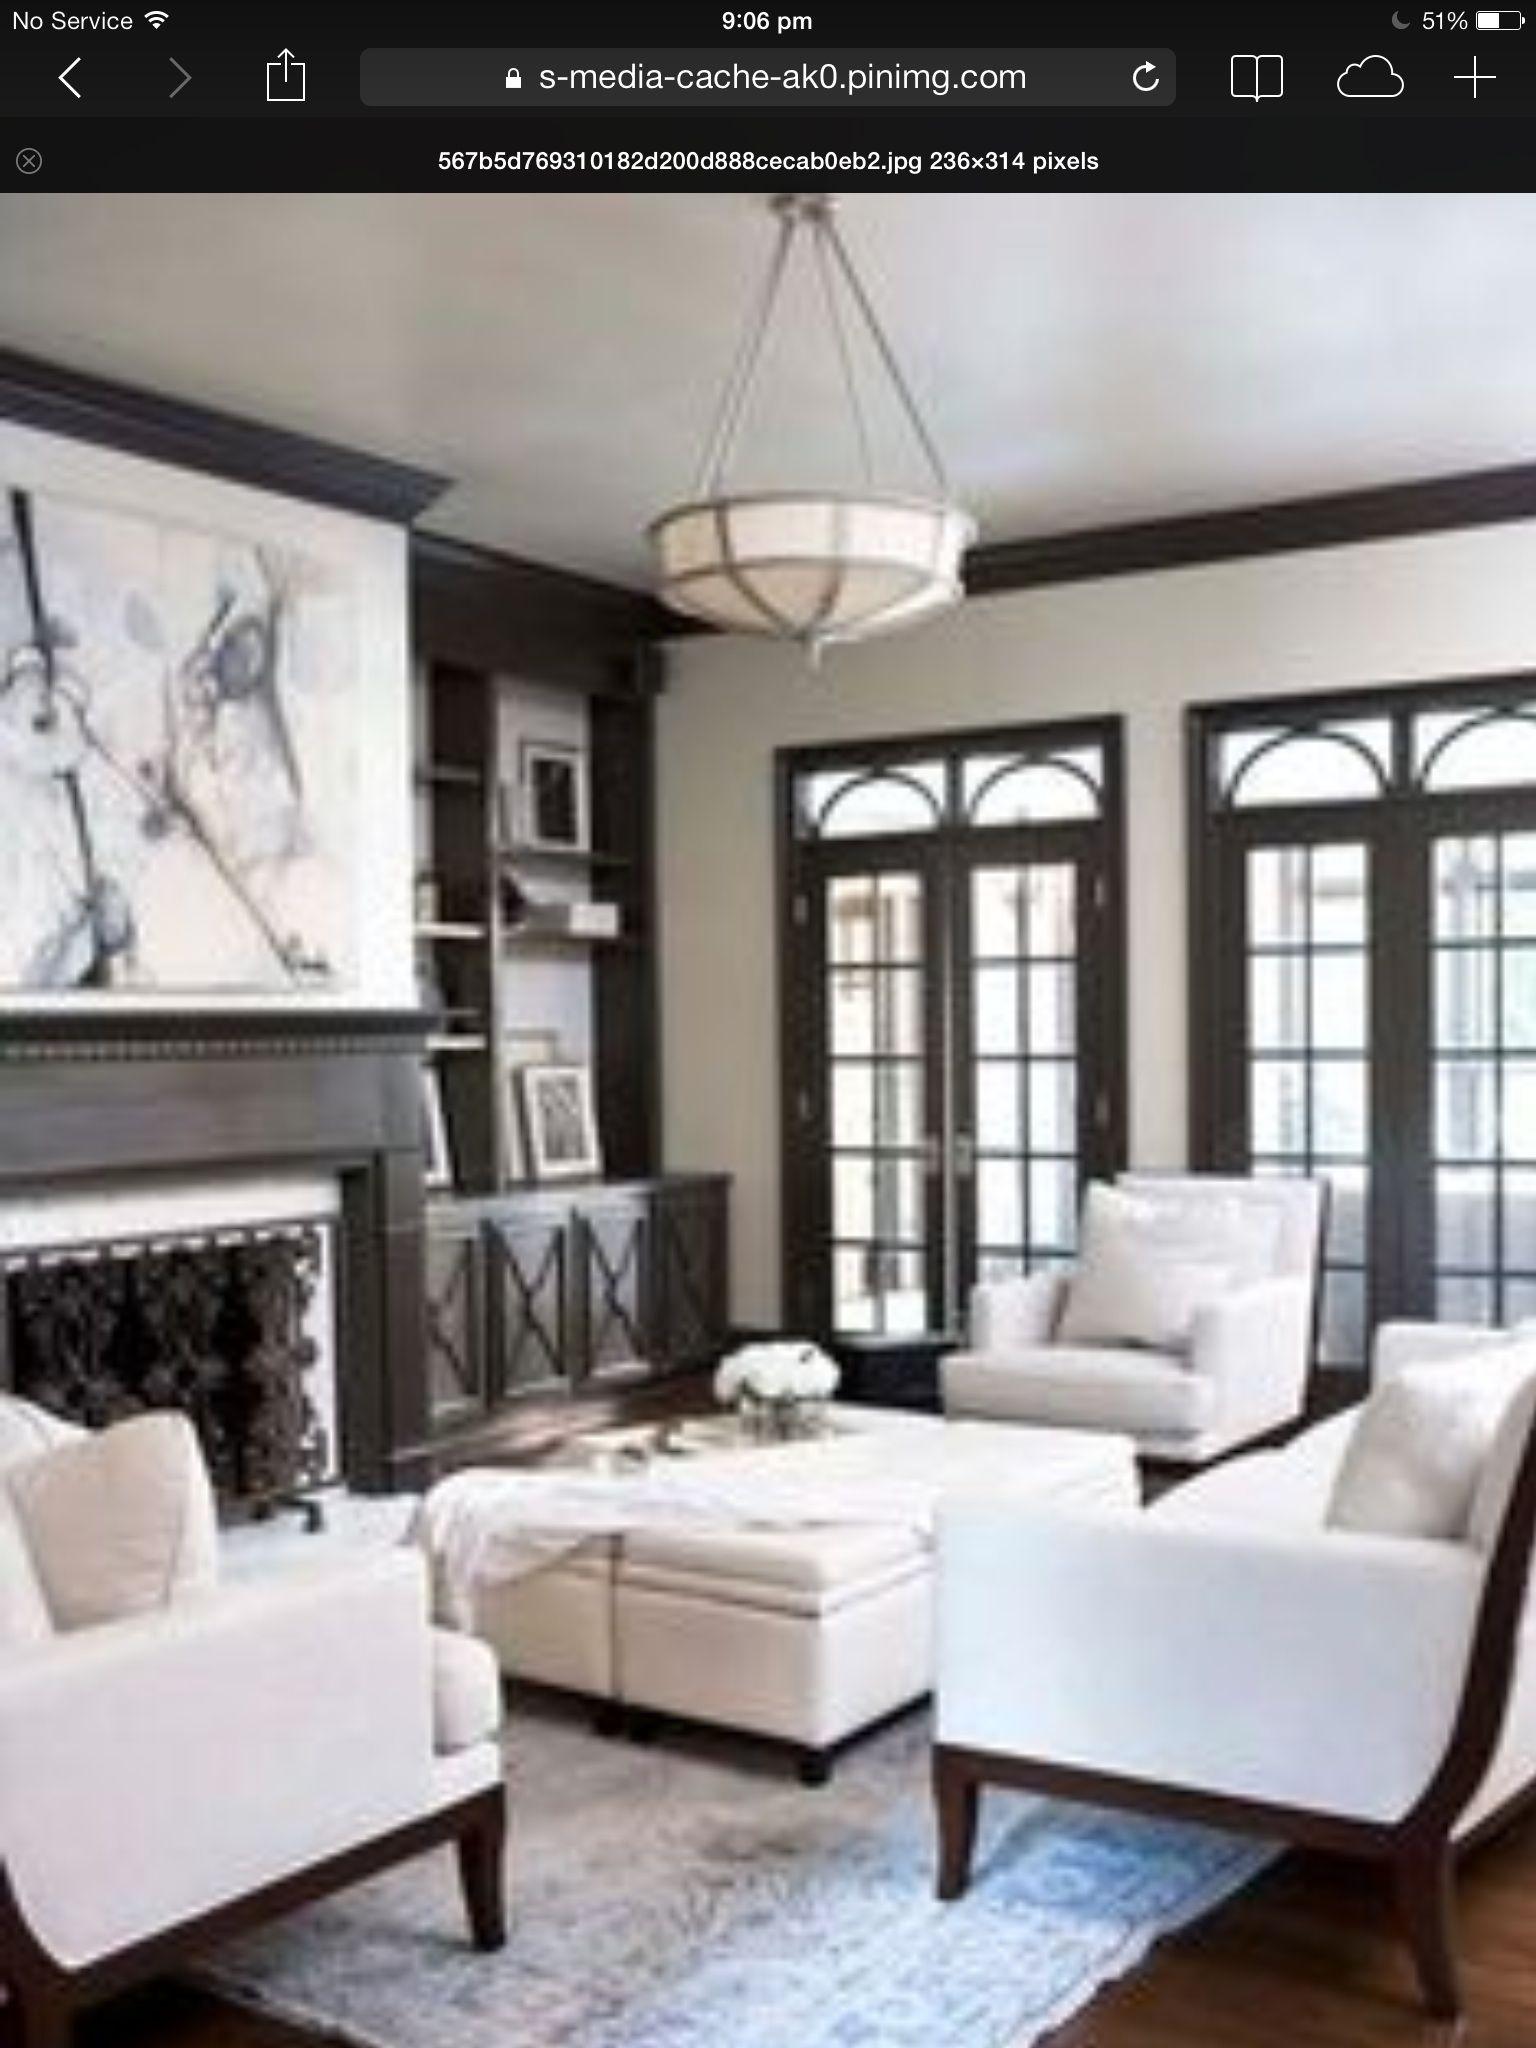 taupe walls black windows dark wood flooring | stylishhome